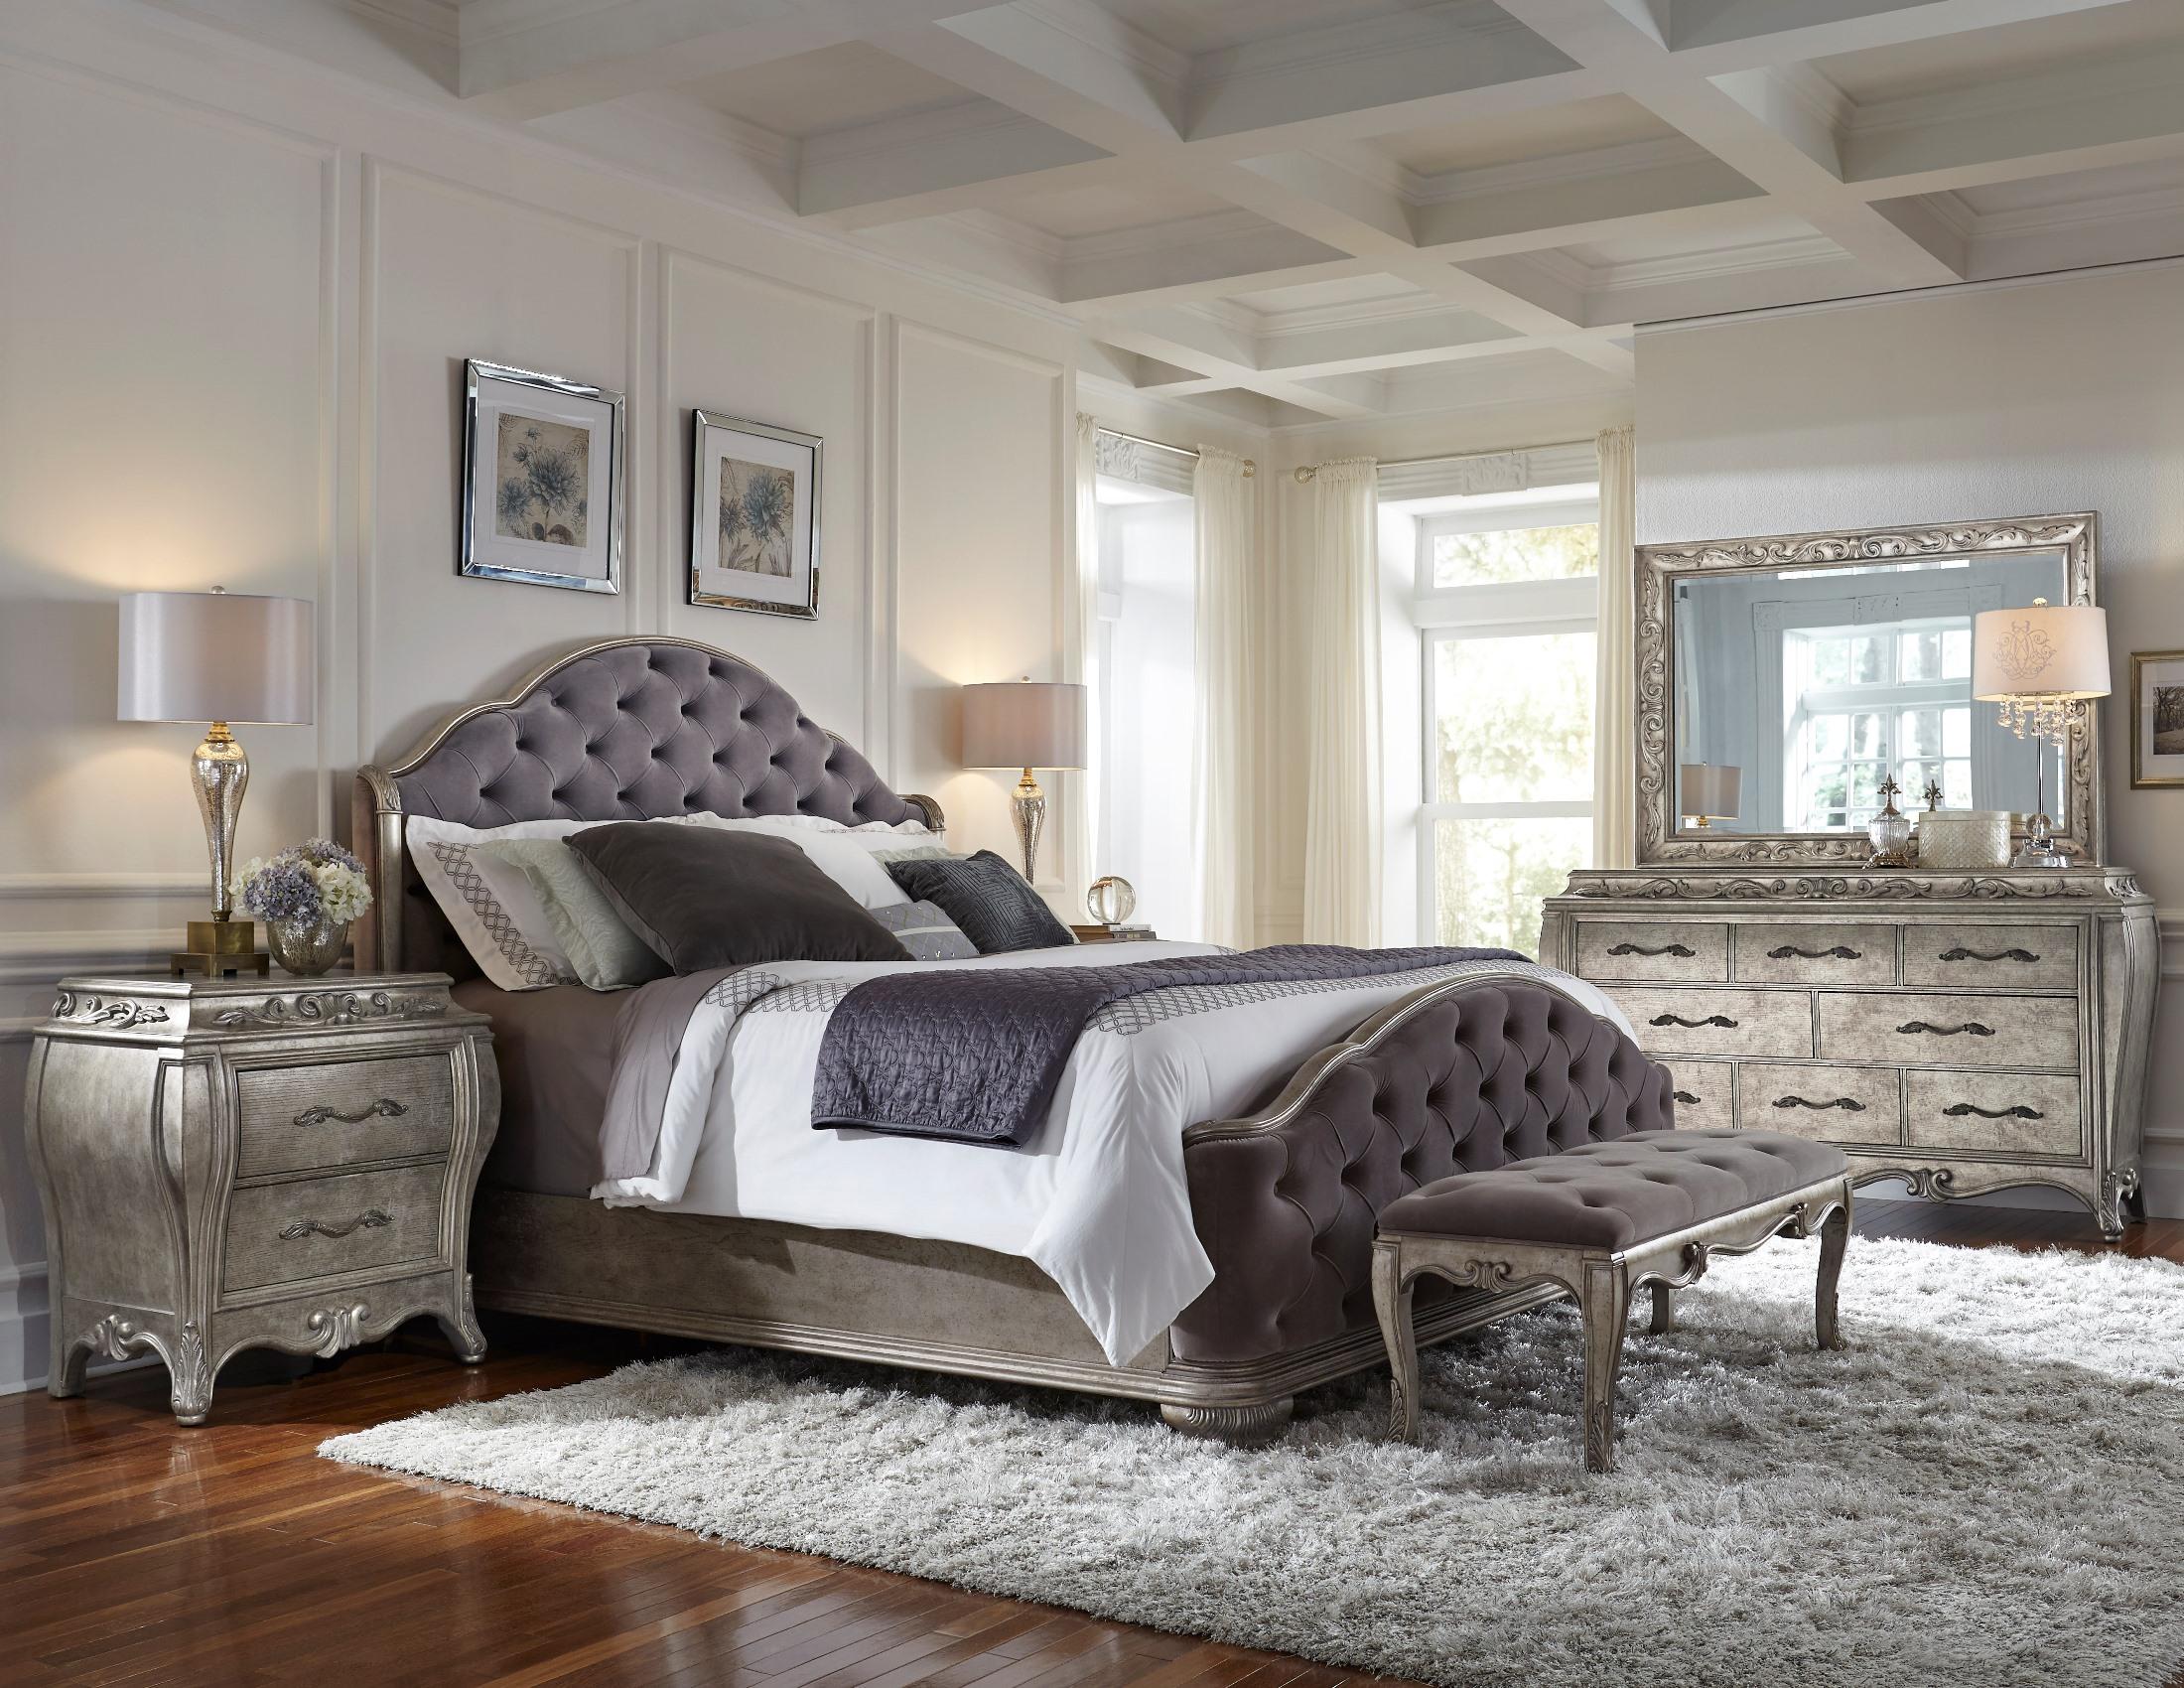 Rhianna Silver Patina Upholstered Panel Bedroom SetMedia Image